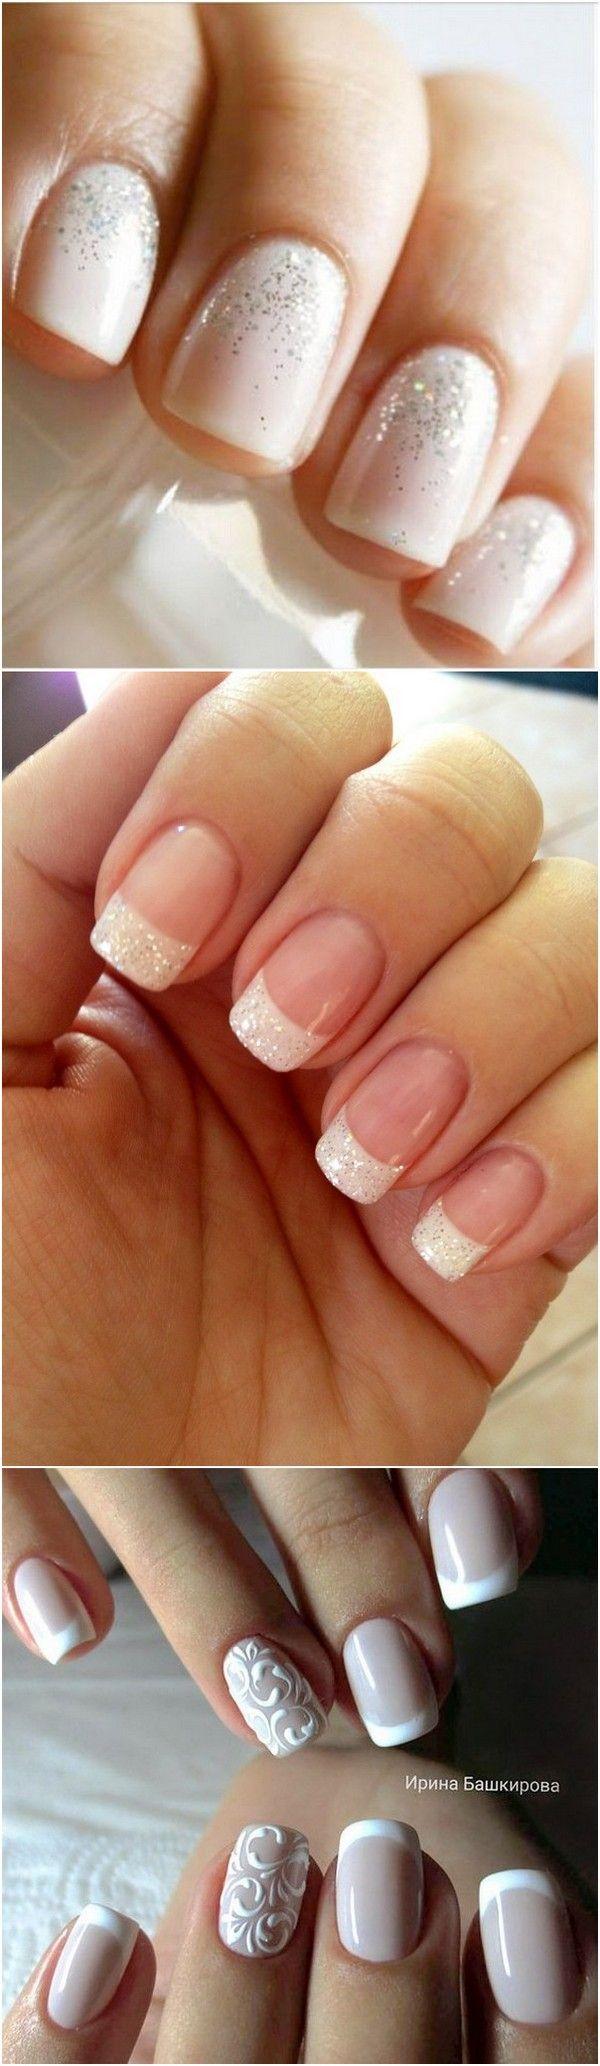 best 25+ wedding nails design ideas on pinterest   wedding nails